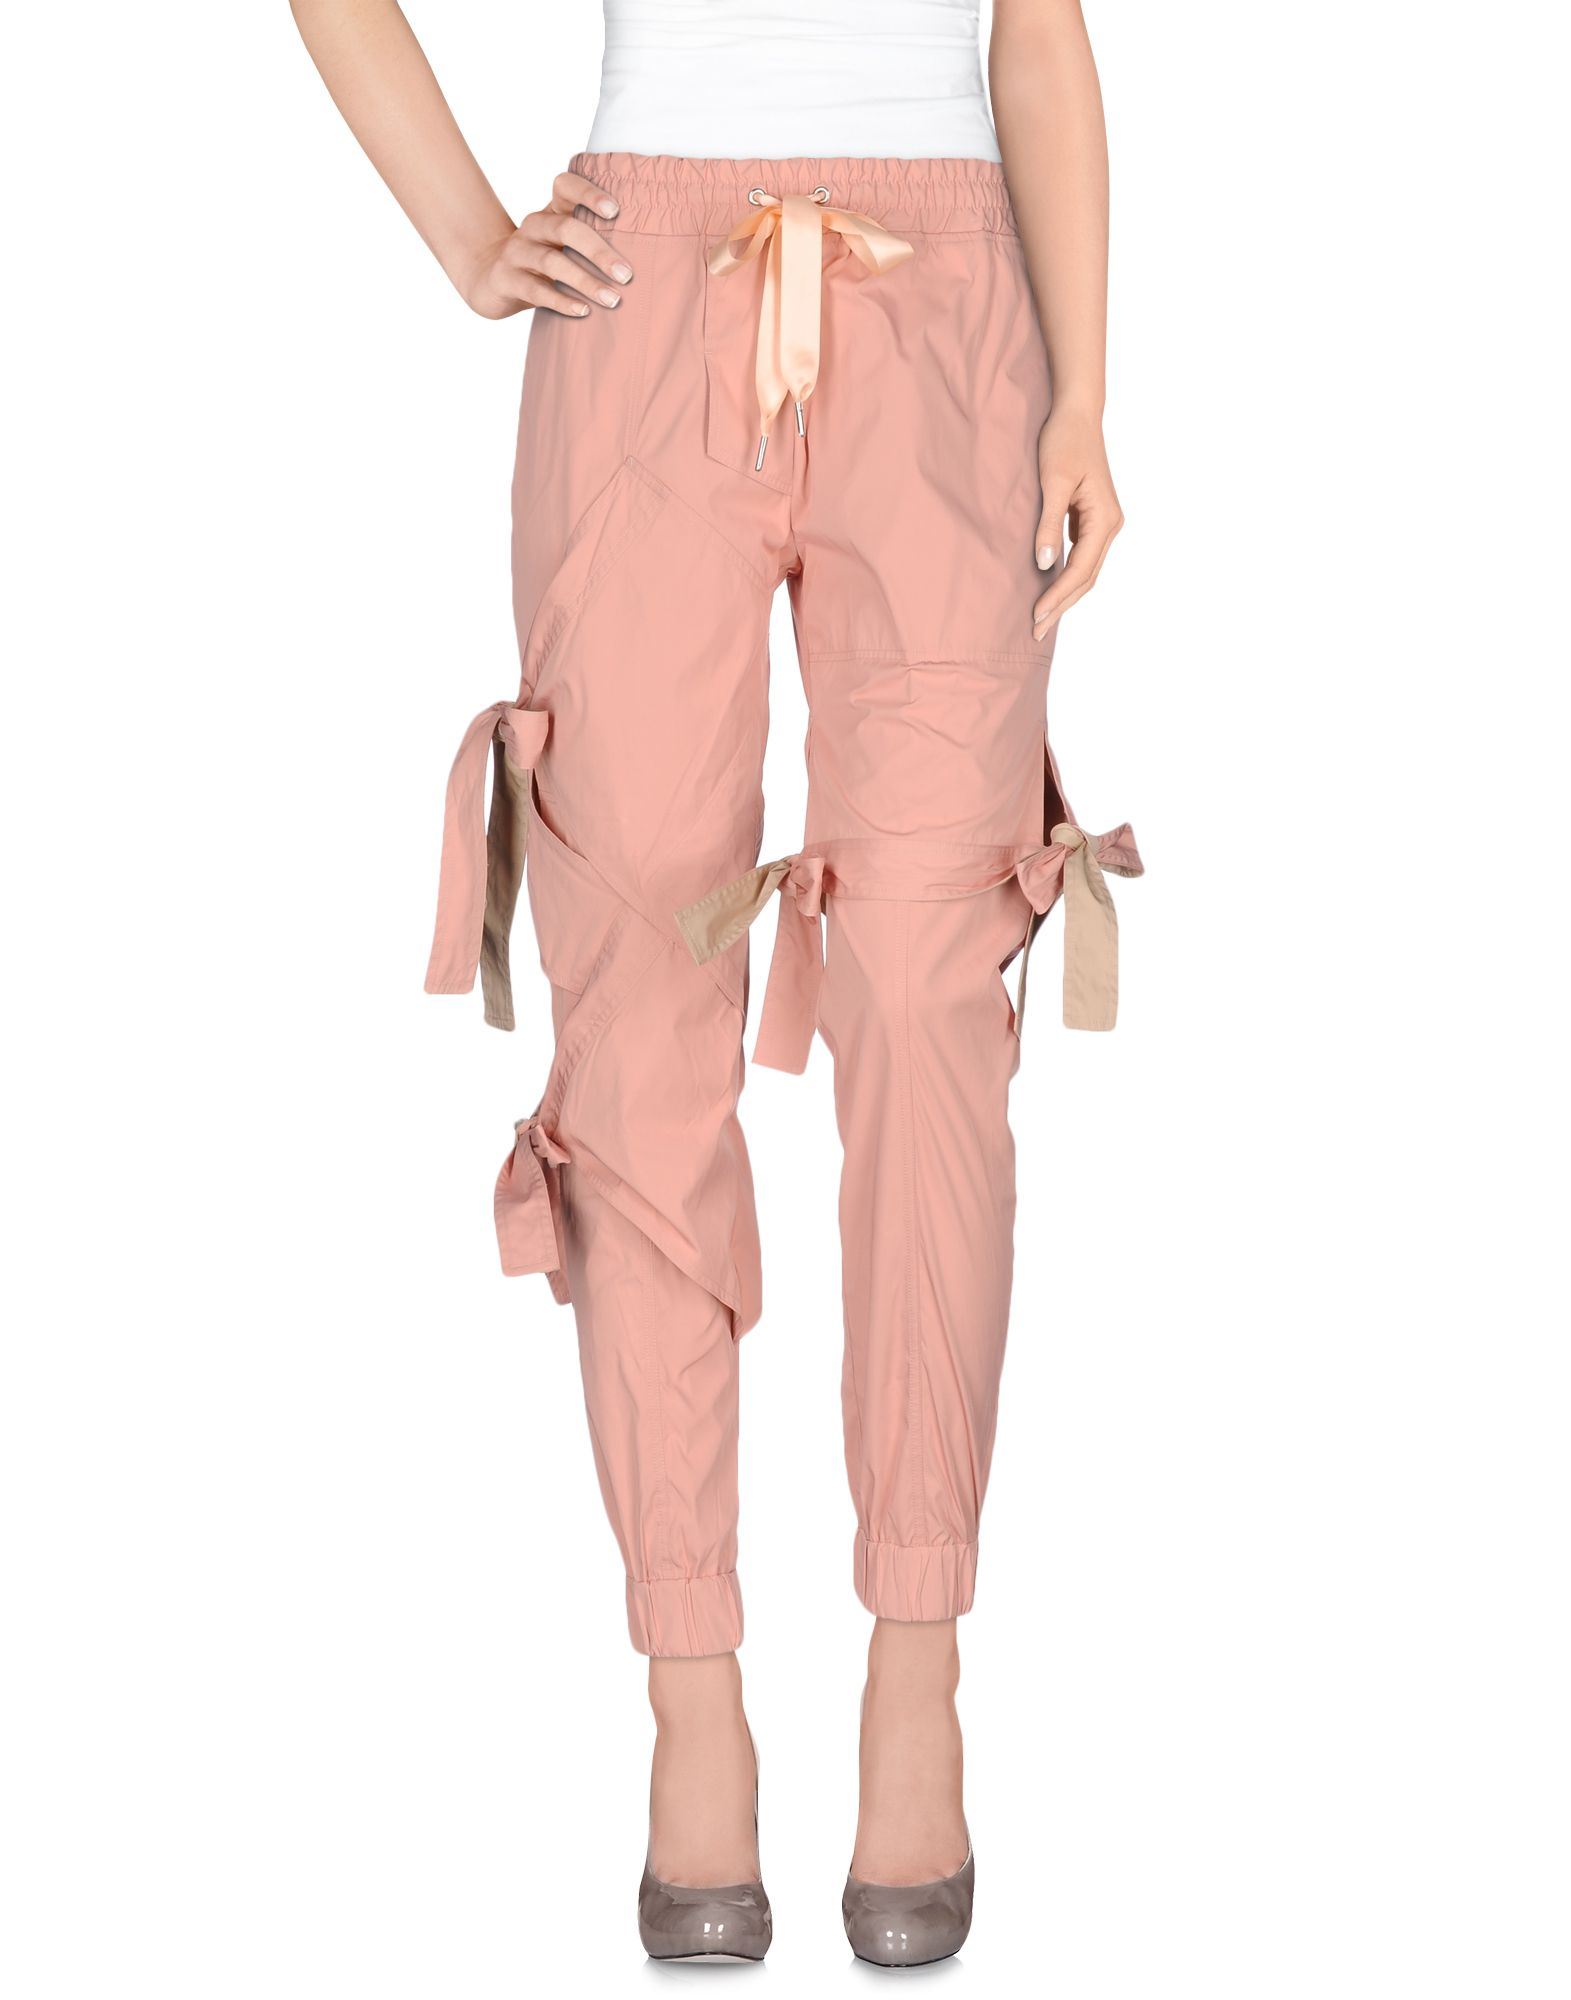 Pantalone Nicopanda Donna - Acquista online su KVuMBC